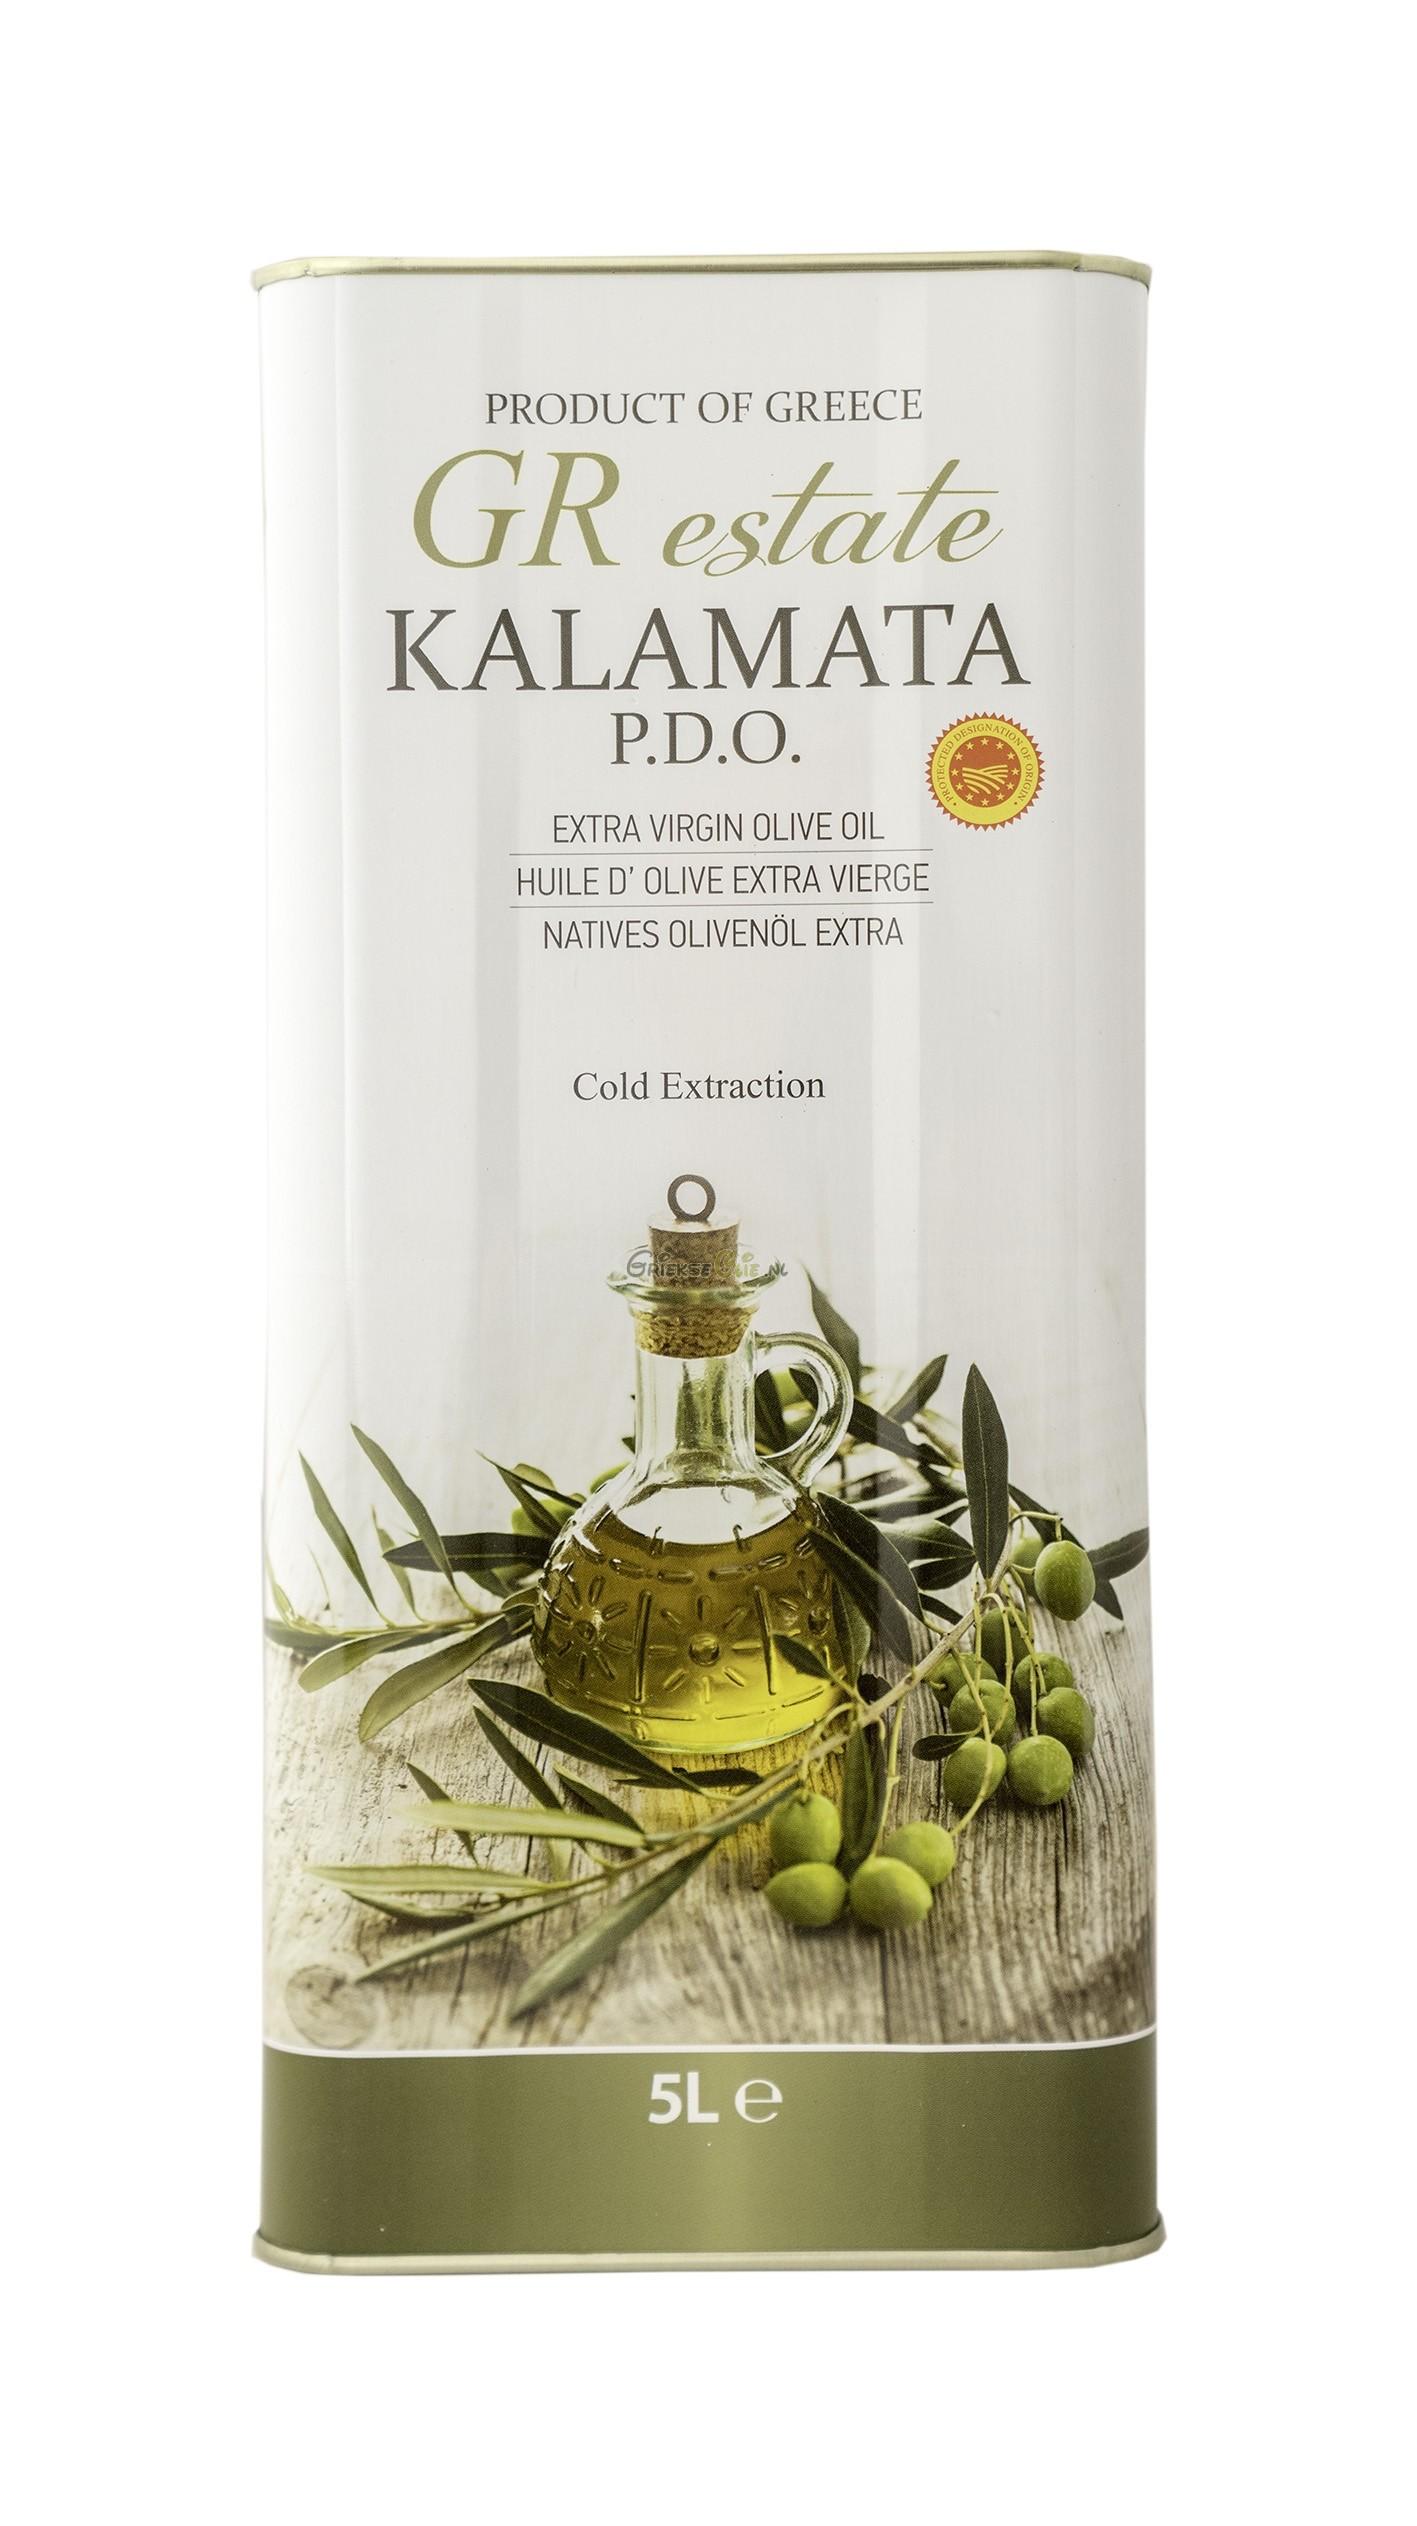 Extra Vergine Olijfolie uit Kalamata 5 liter in blik - oogst 2019-2020